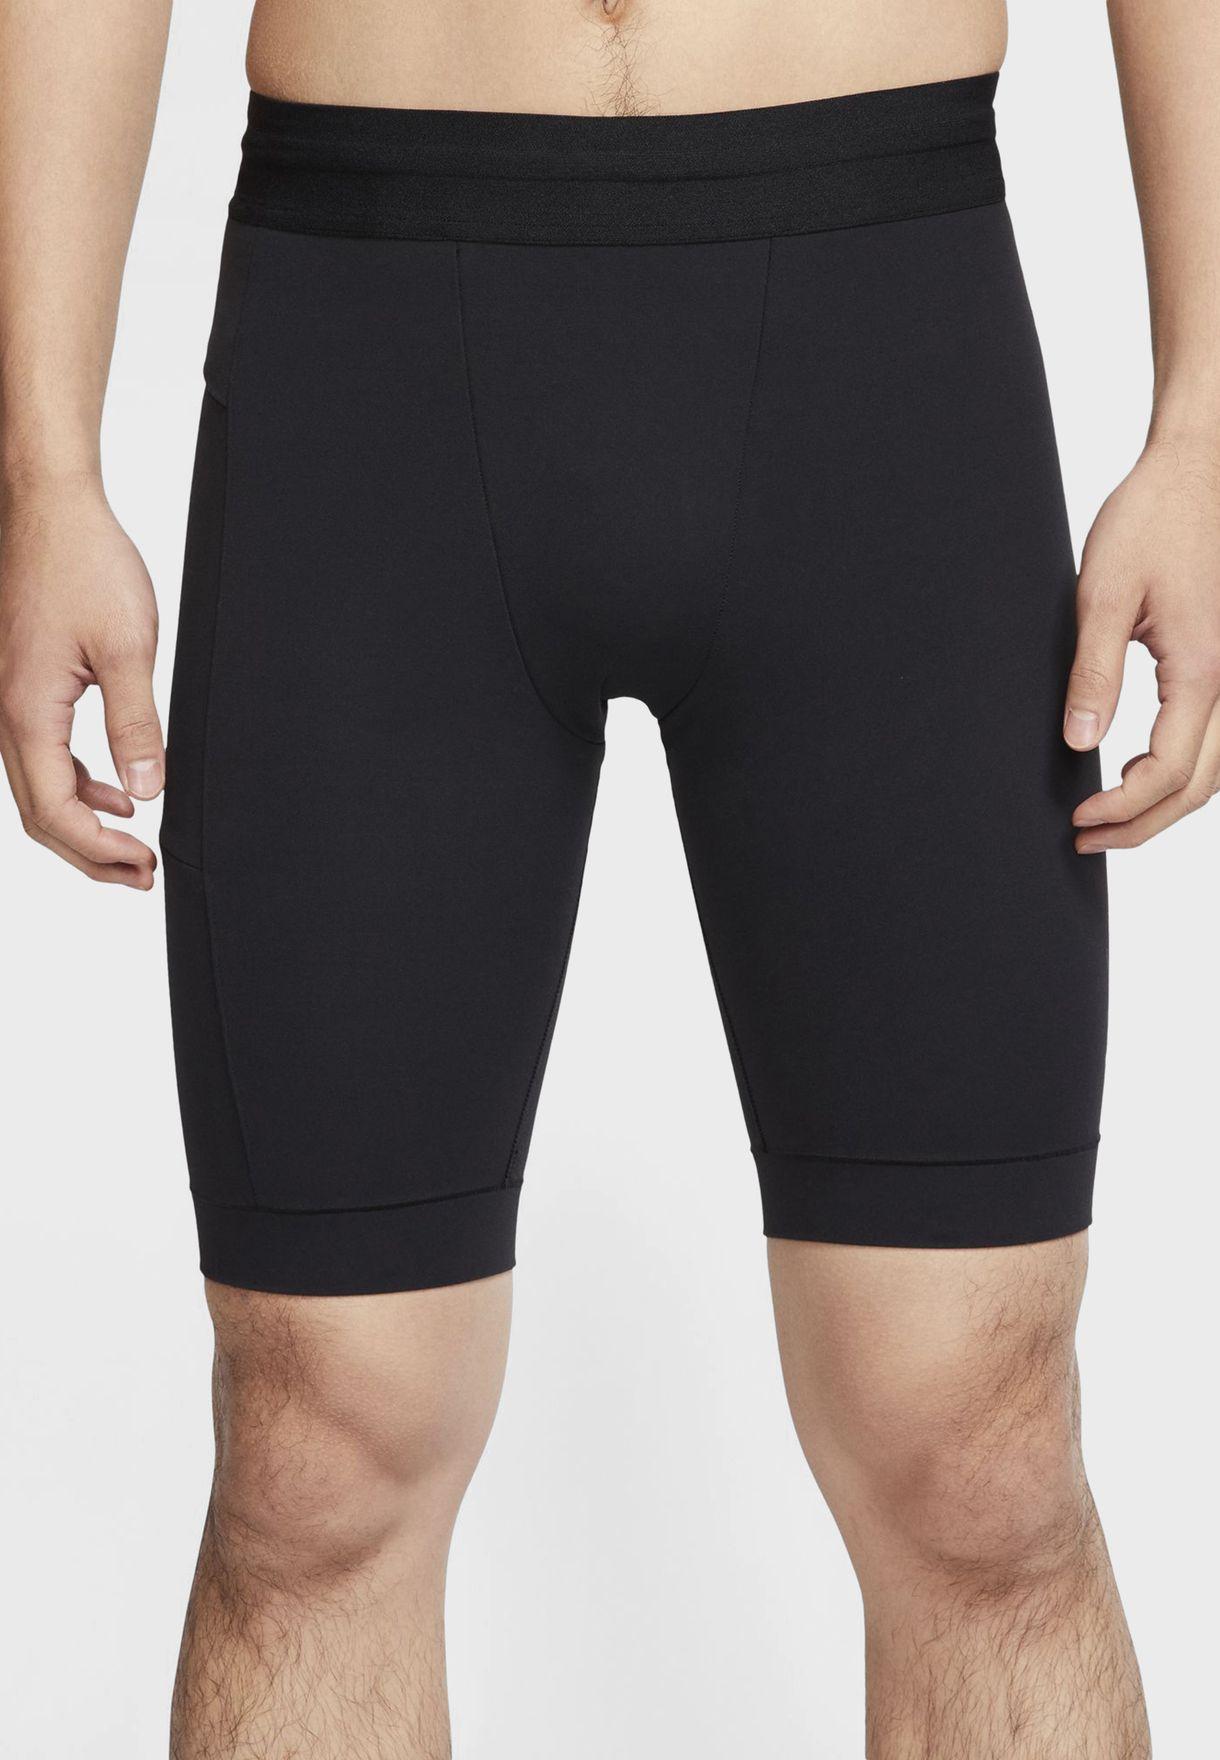 Dri-FIT Yoga Shorts